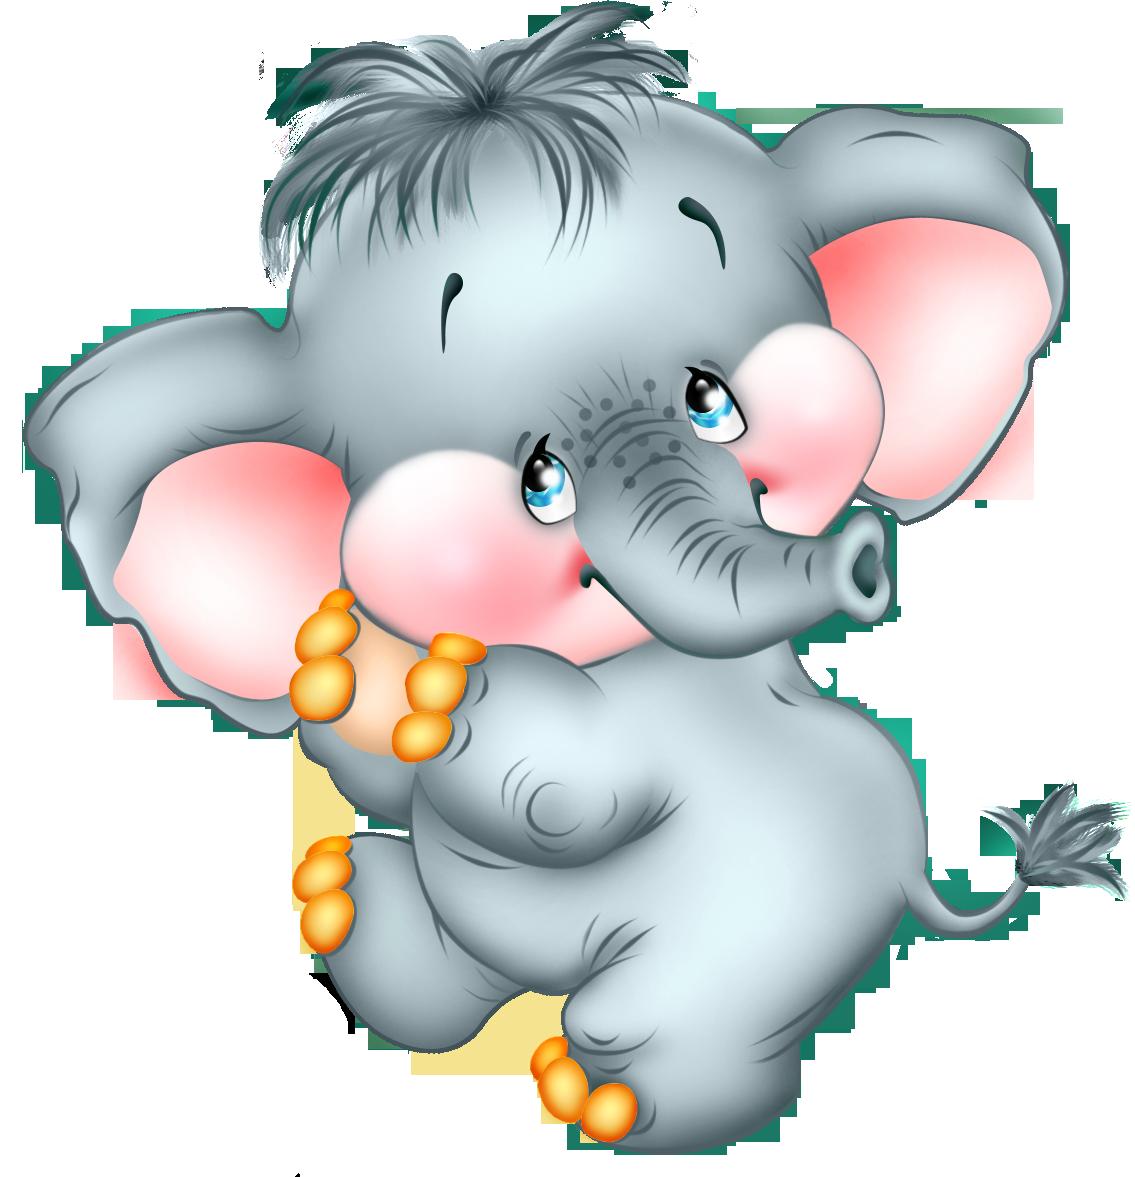 Pin By Nishanthprabu On Stempel En Afbeeldingen Gekleurd Elephant Cartoon Images Cartoon Elephant Baby Elephant Cartoon Jumbo the elephant matriarch film timothy q. cartoon elephant